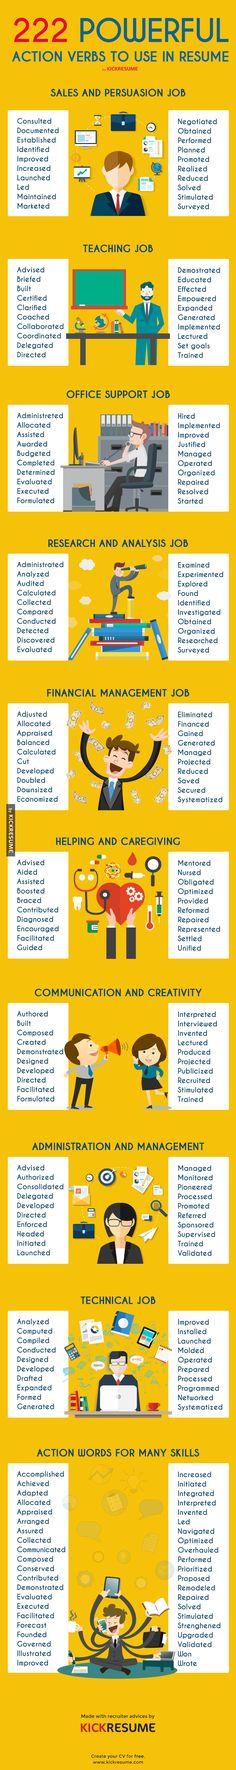 Resume Examples Basic Resume Examples Basic Resume Outline Sample - simple resume examples for jobs